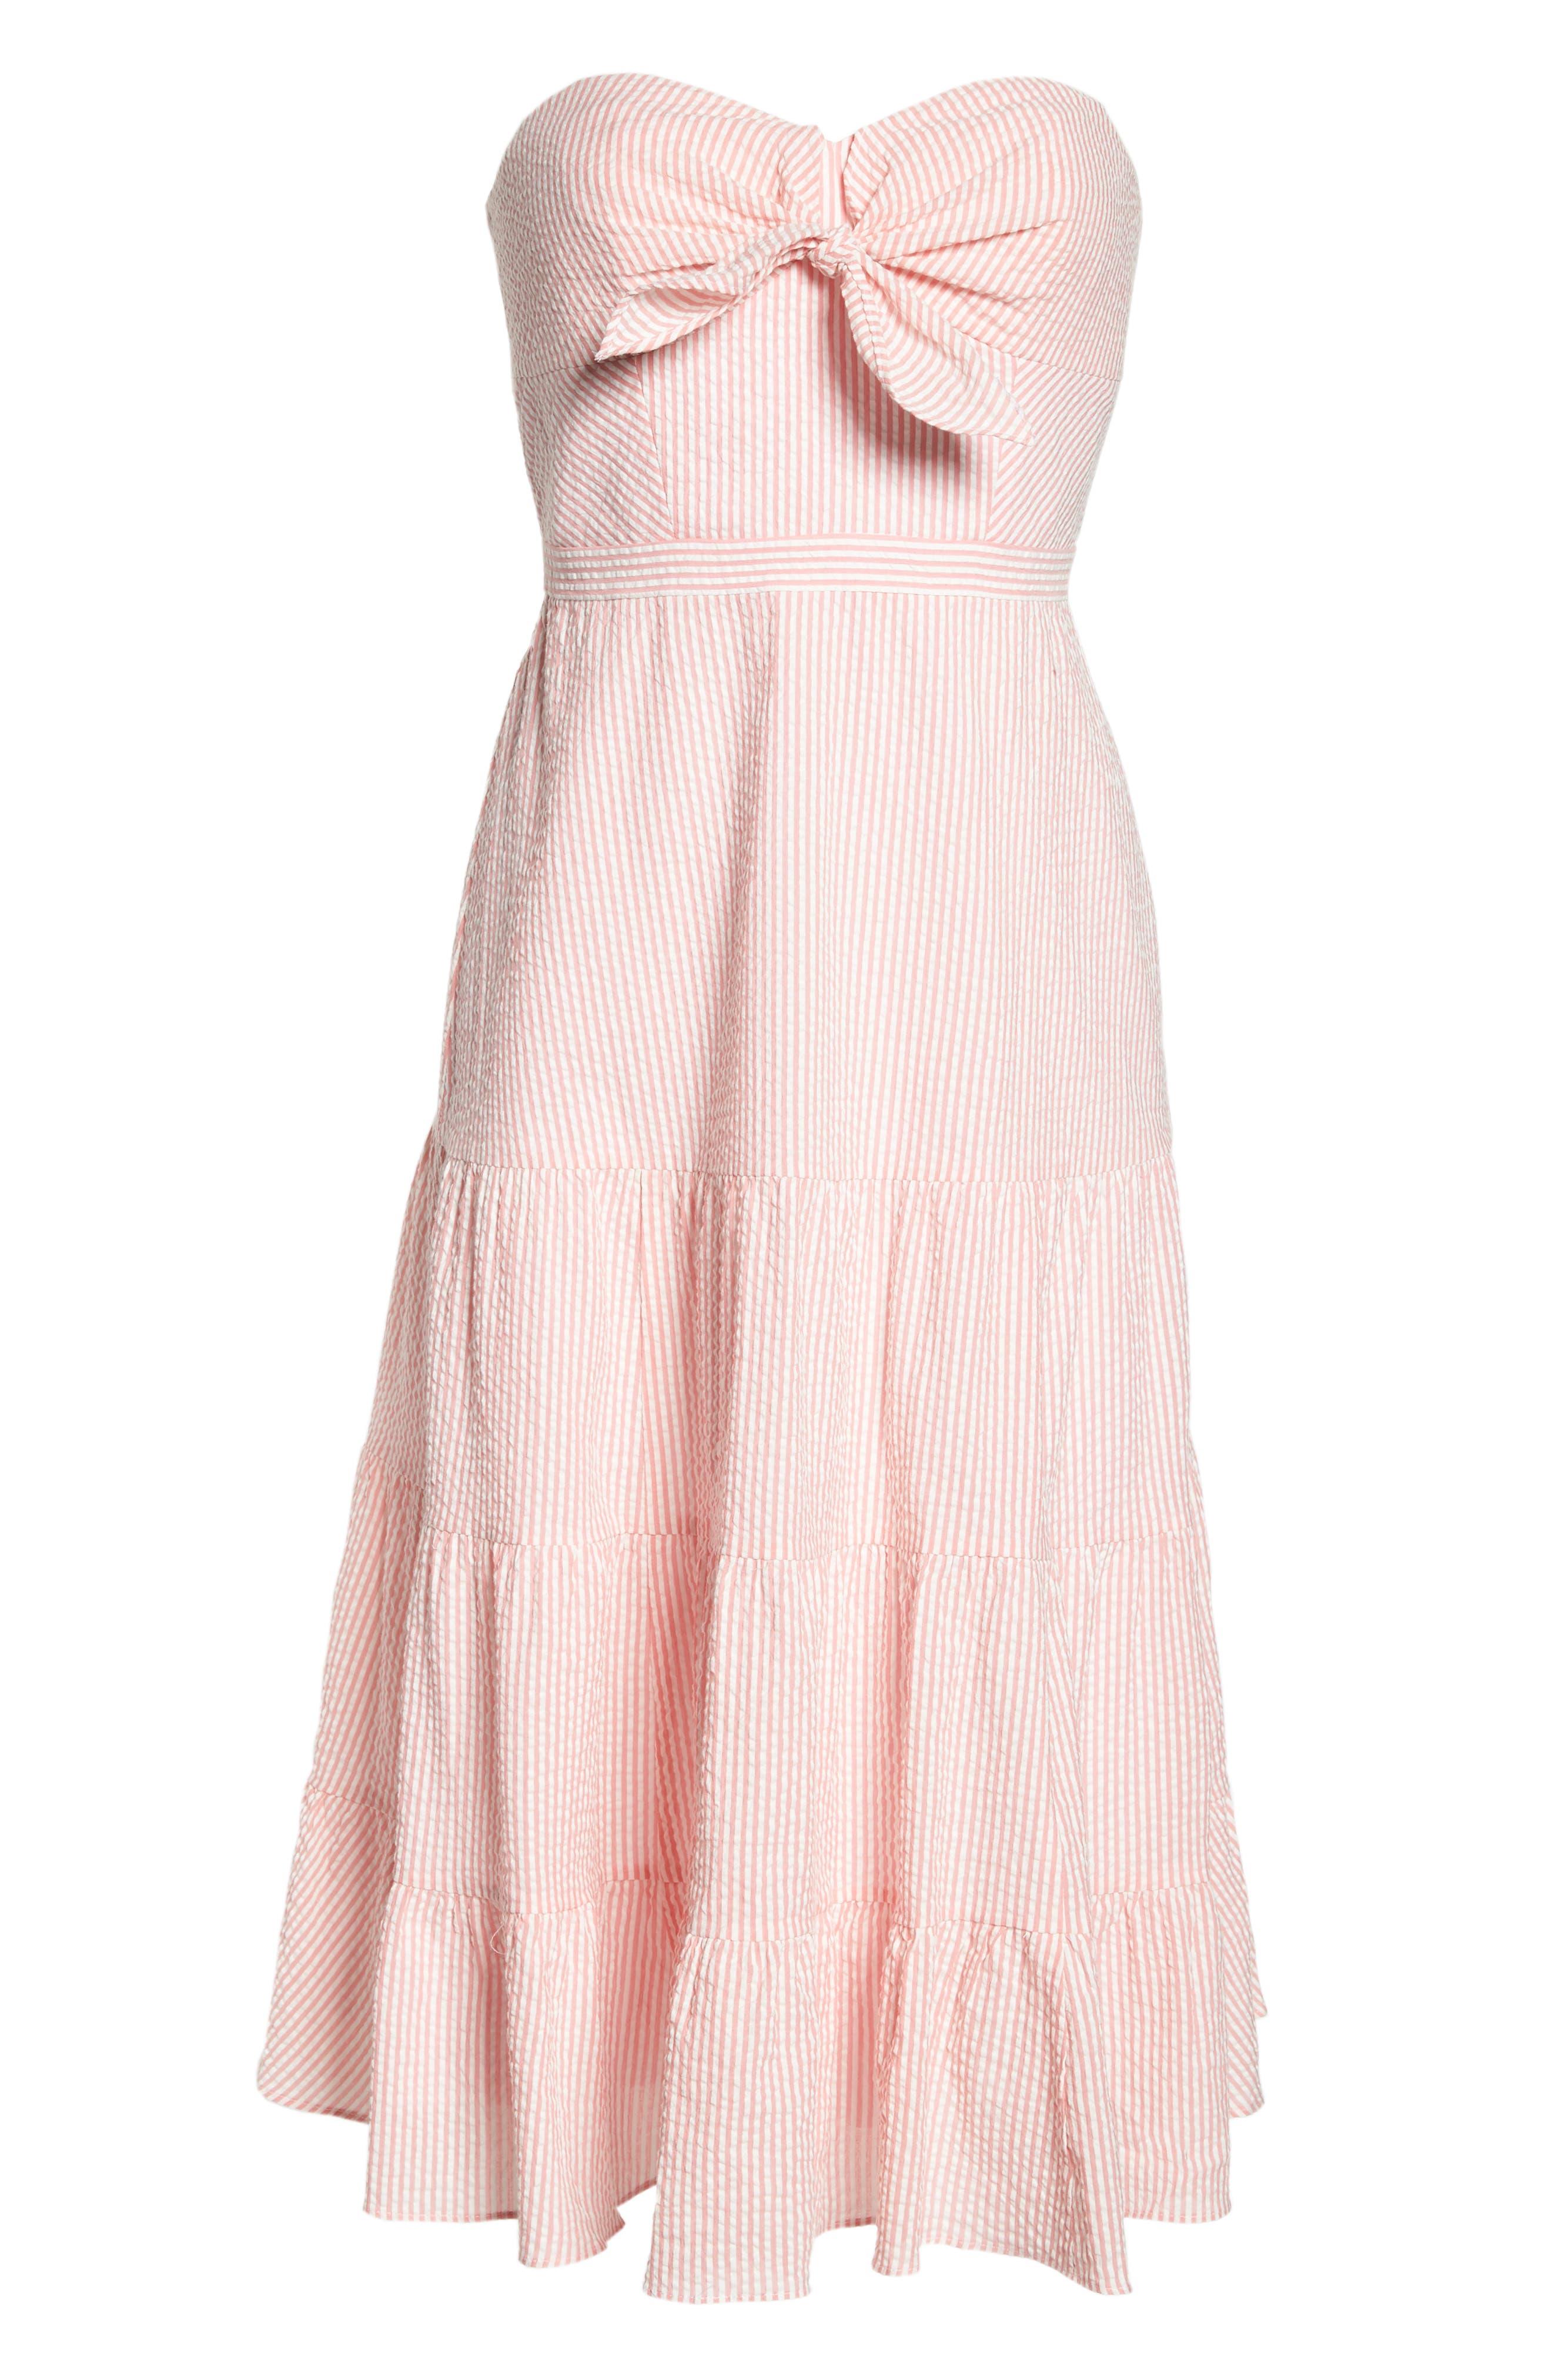 Tie Front Strapless Dress,                             Alternate thumbnail 13, color,